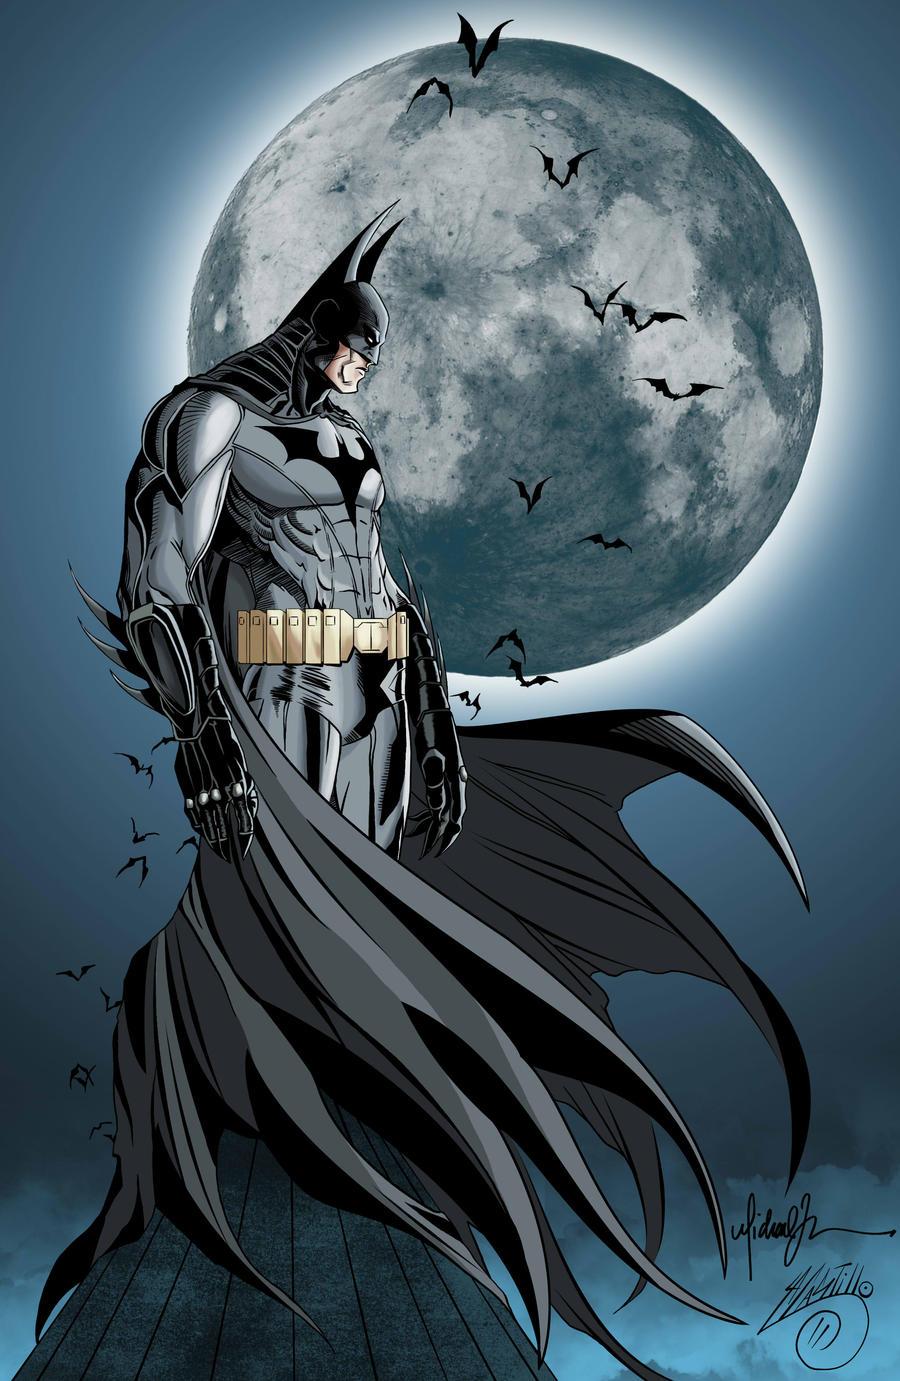 http://fc02.deviantart.net/fs71/i/2012/230/7/2/batman_new_52_style_michael_turner_by_swave18-d5bm3u9.jpg